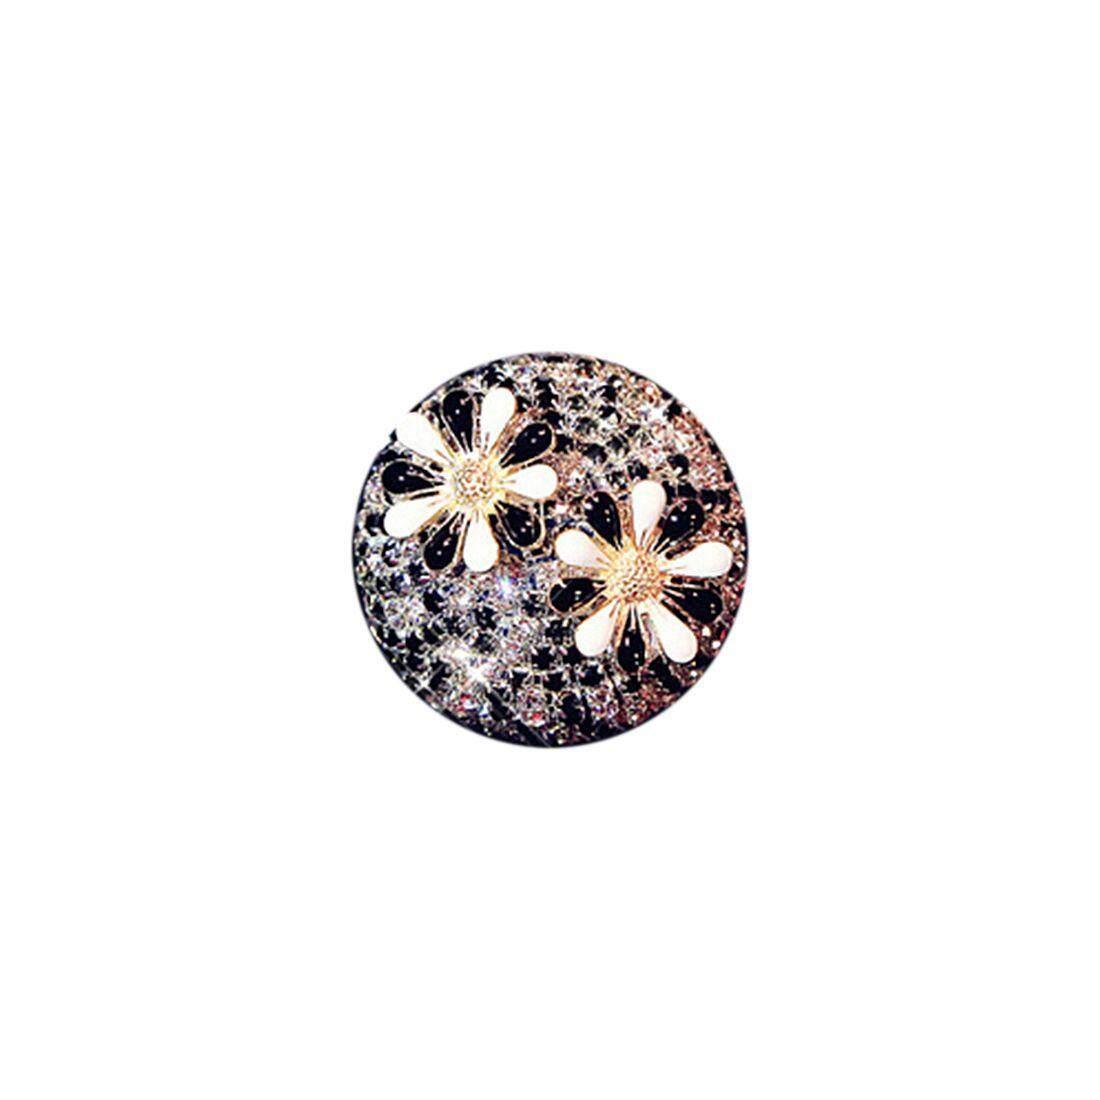 Car Perfume Diamond Clip (two Flowers Pattern) Sun5 By Sunnny2015